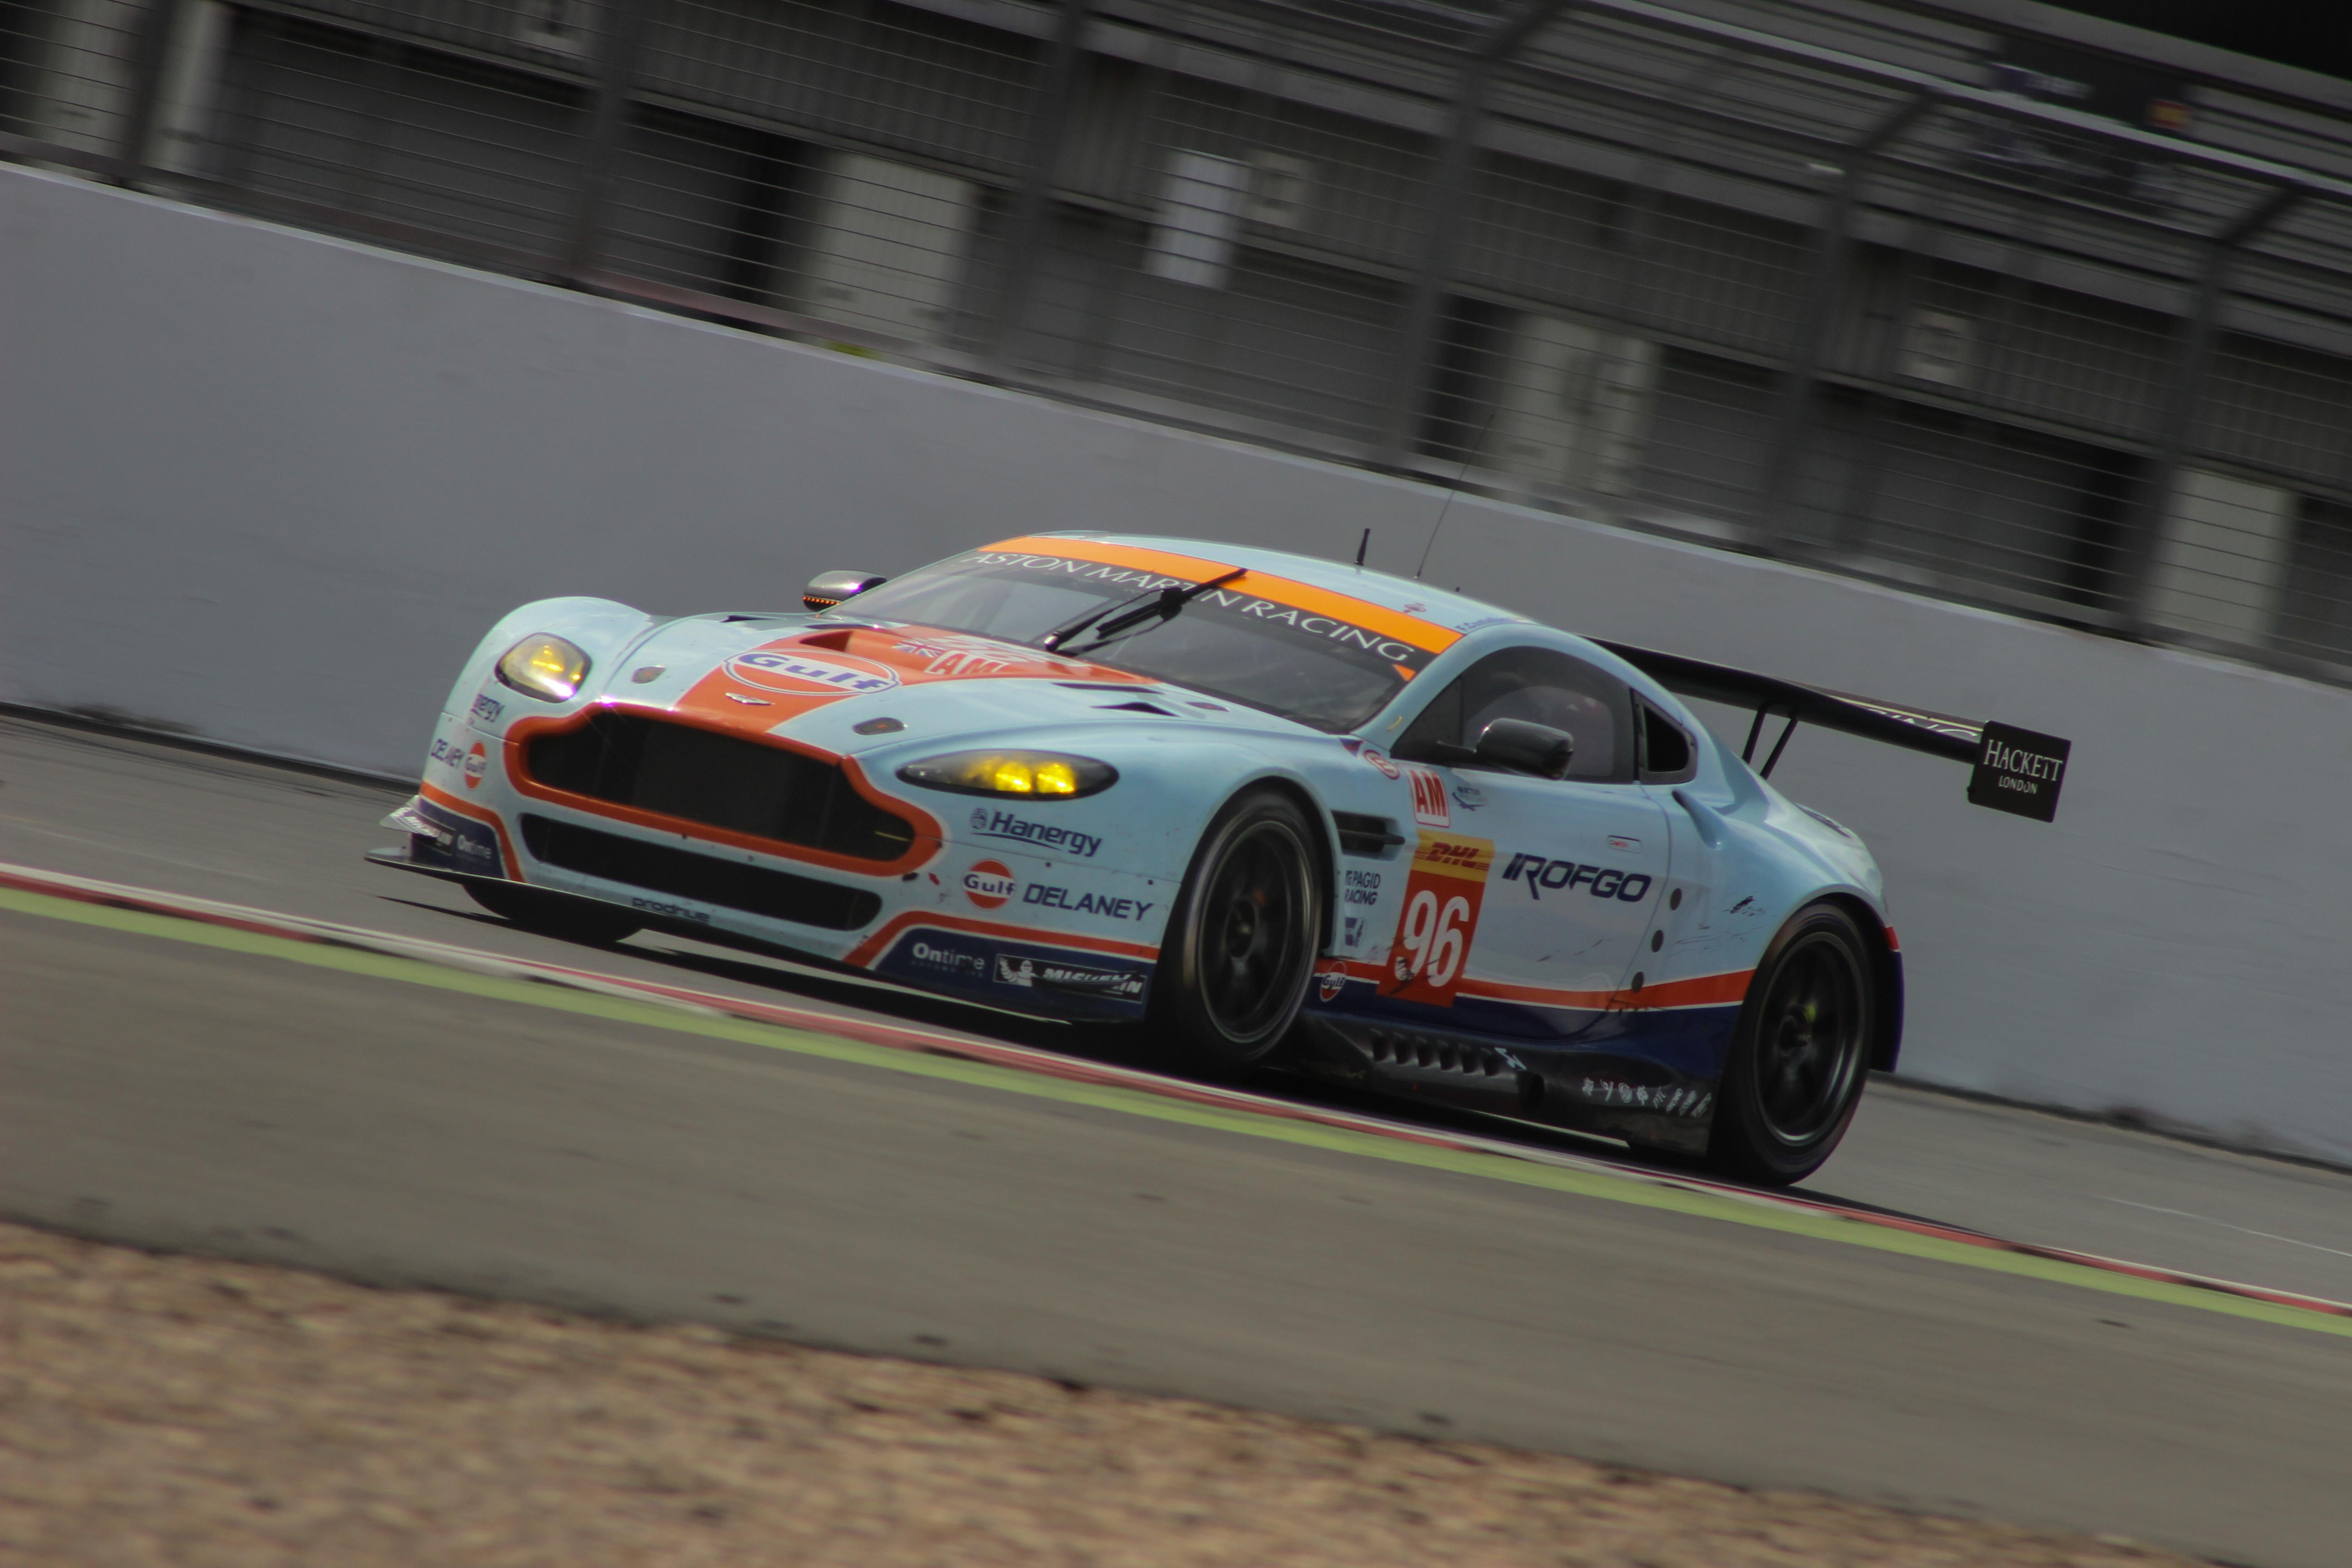 29 Aston Martin #96